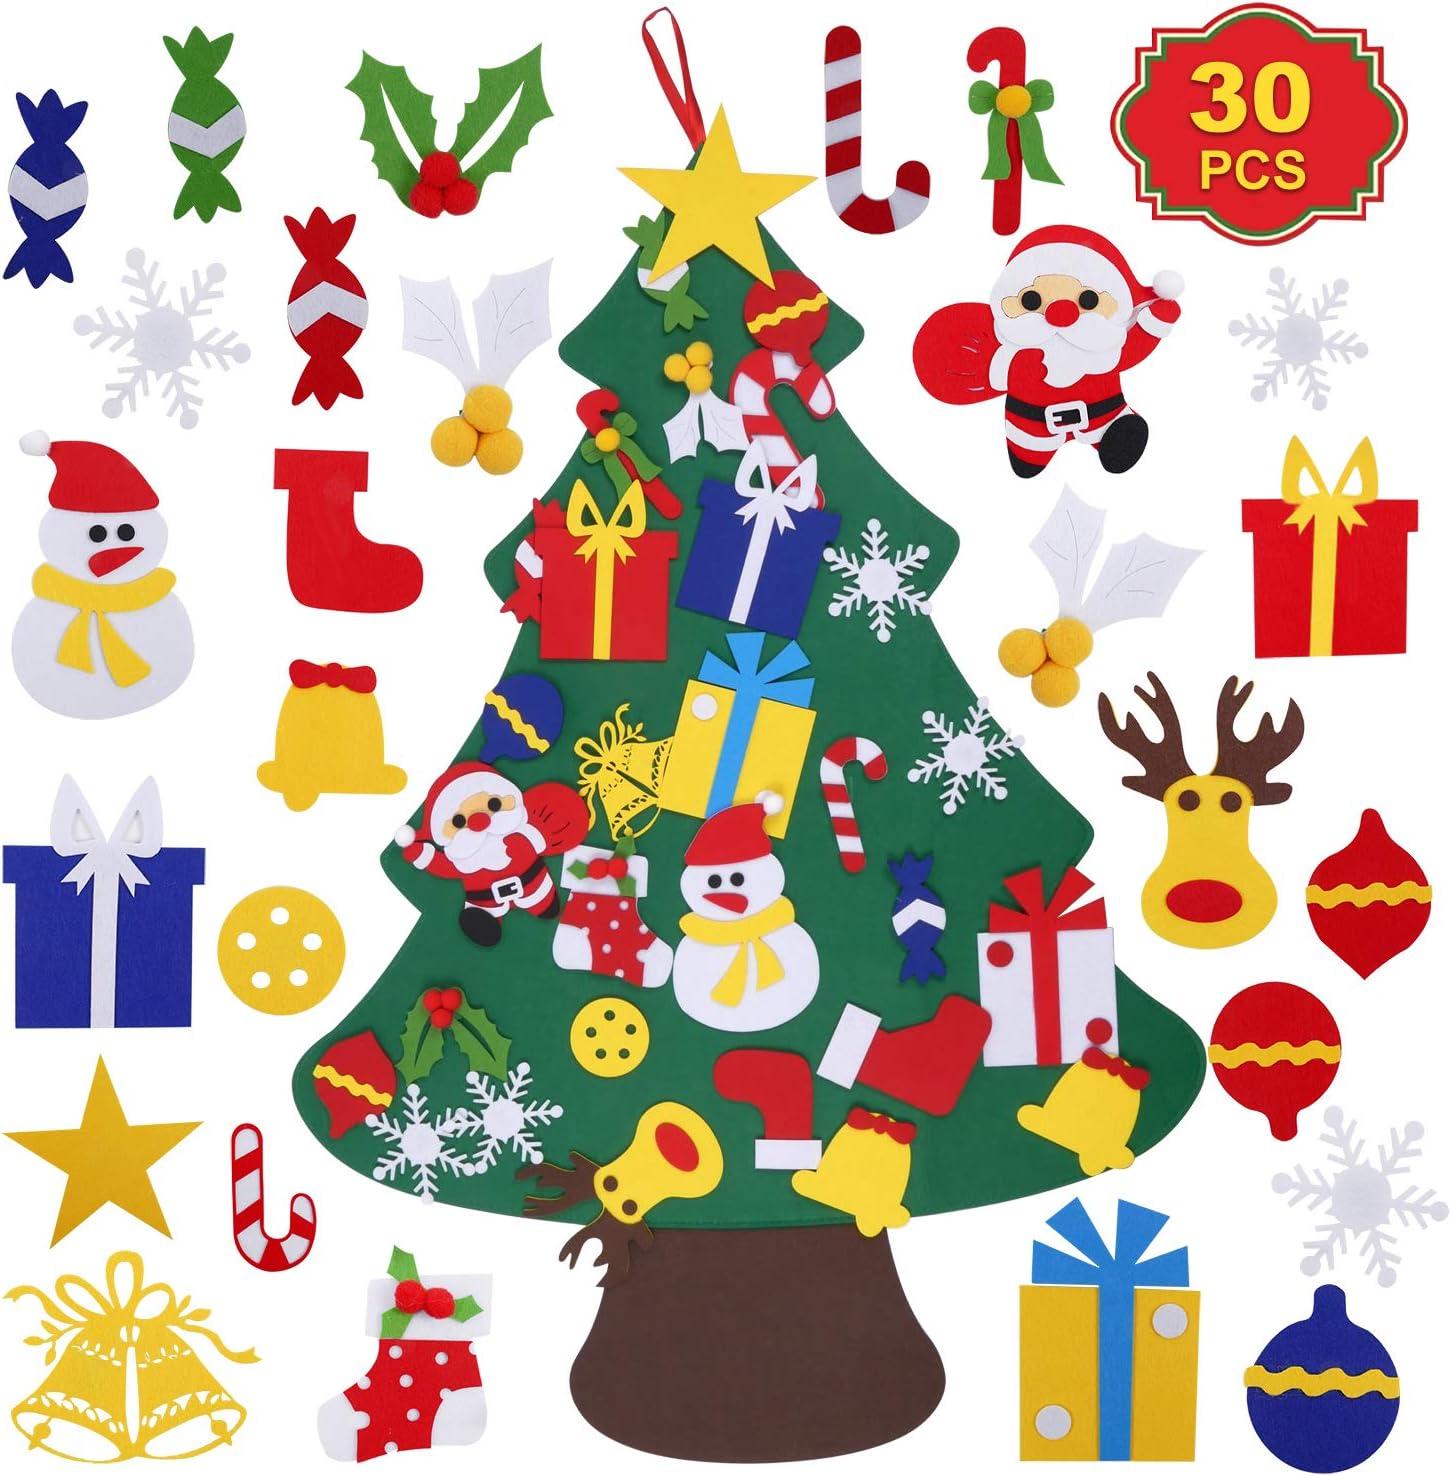 SHEMKAR DIY Felt Christmas Tree DIY Wall Christmas Tree with 30PCS Detachable Ornaments Xmas Wall Decor for Kids New Year Handmade Christmas Door Wall Hanging Decorations